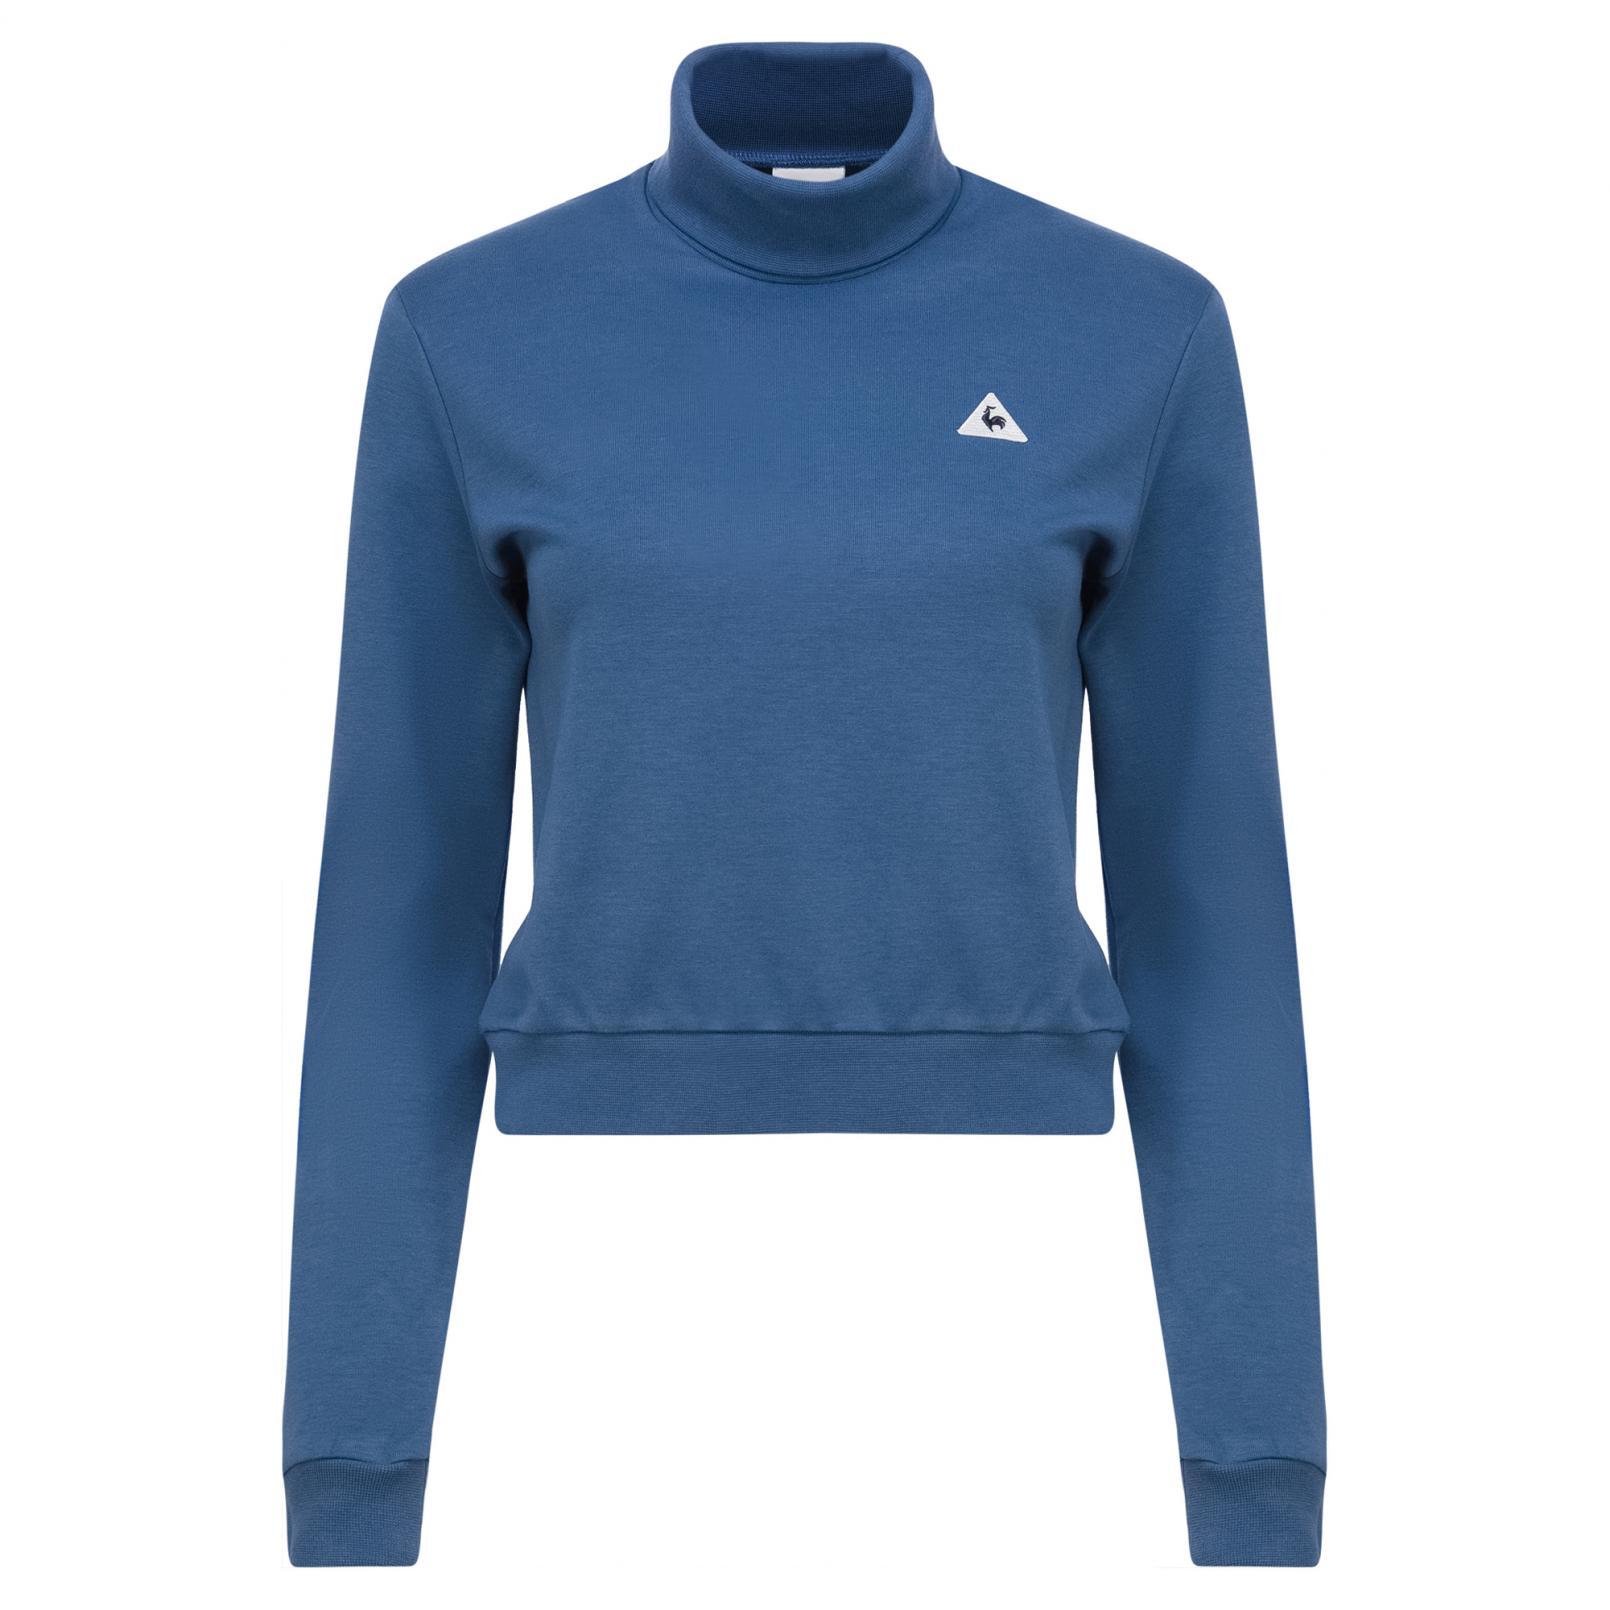 Sweatshirts & Hoodies – Le Coq Sportif Essentiels Crop Crew Sweat Blue